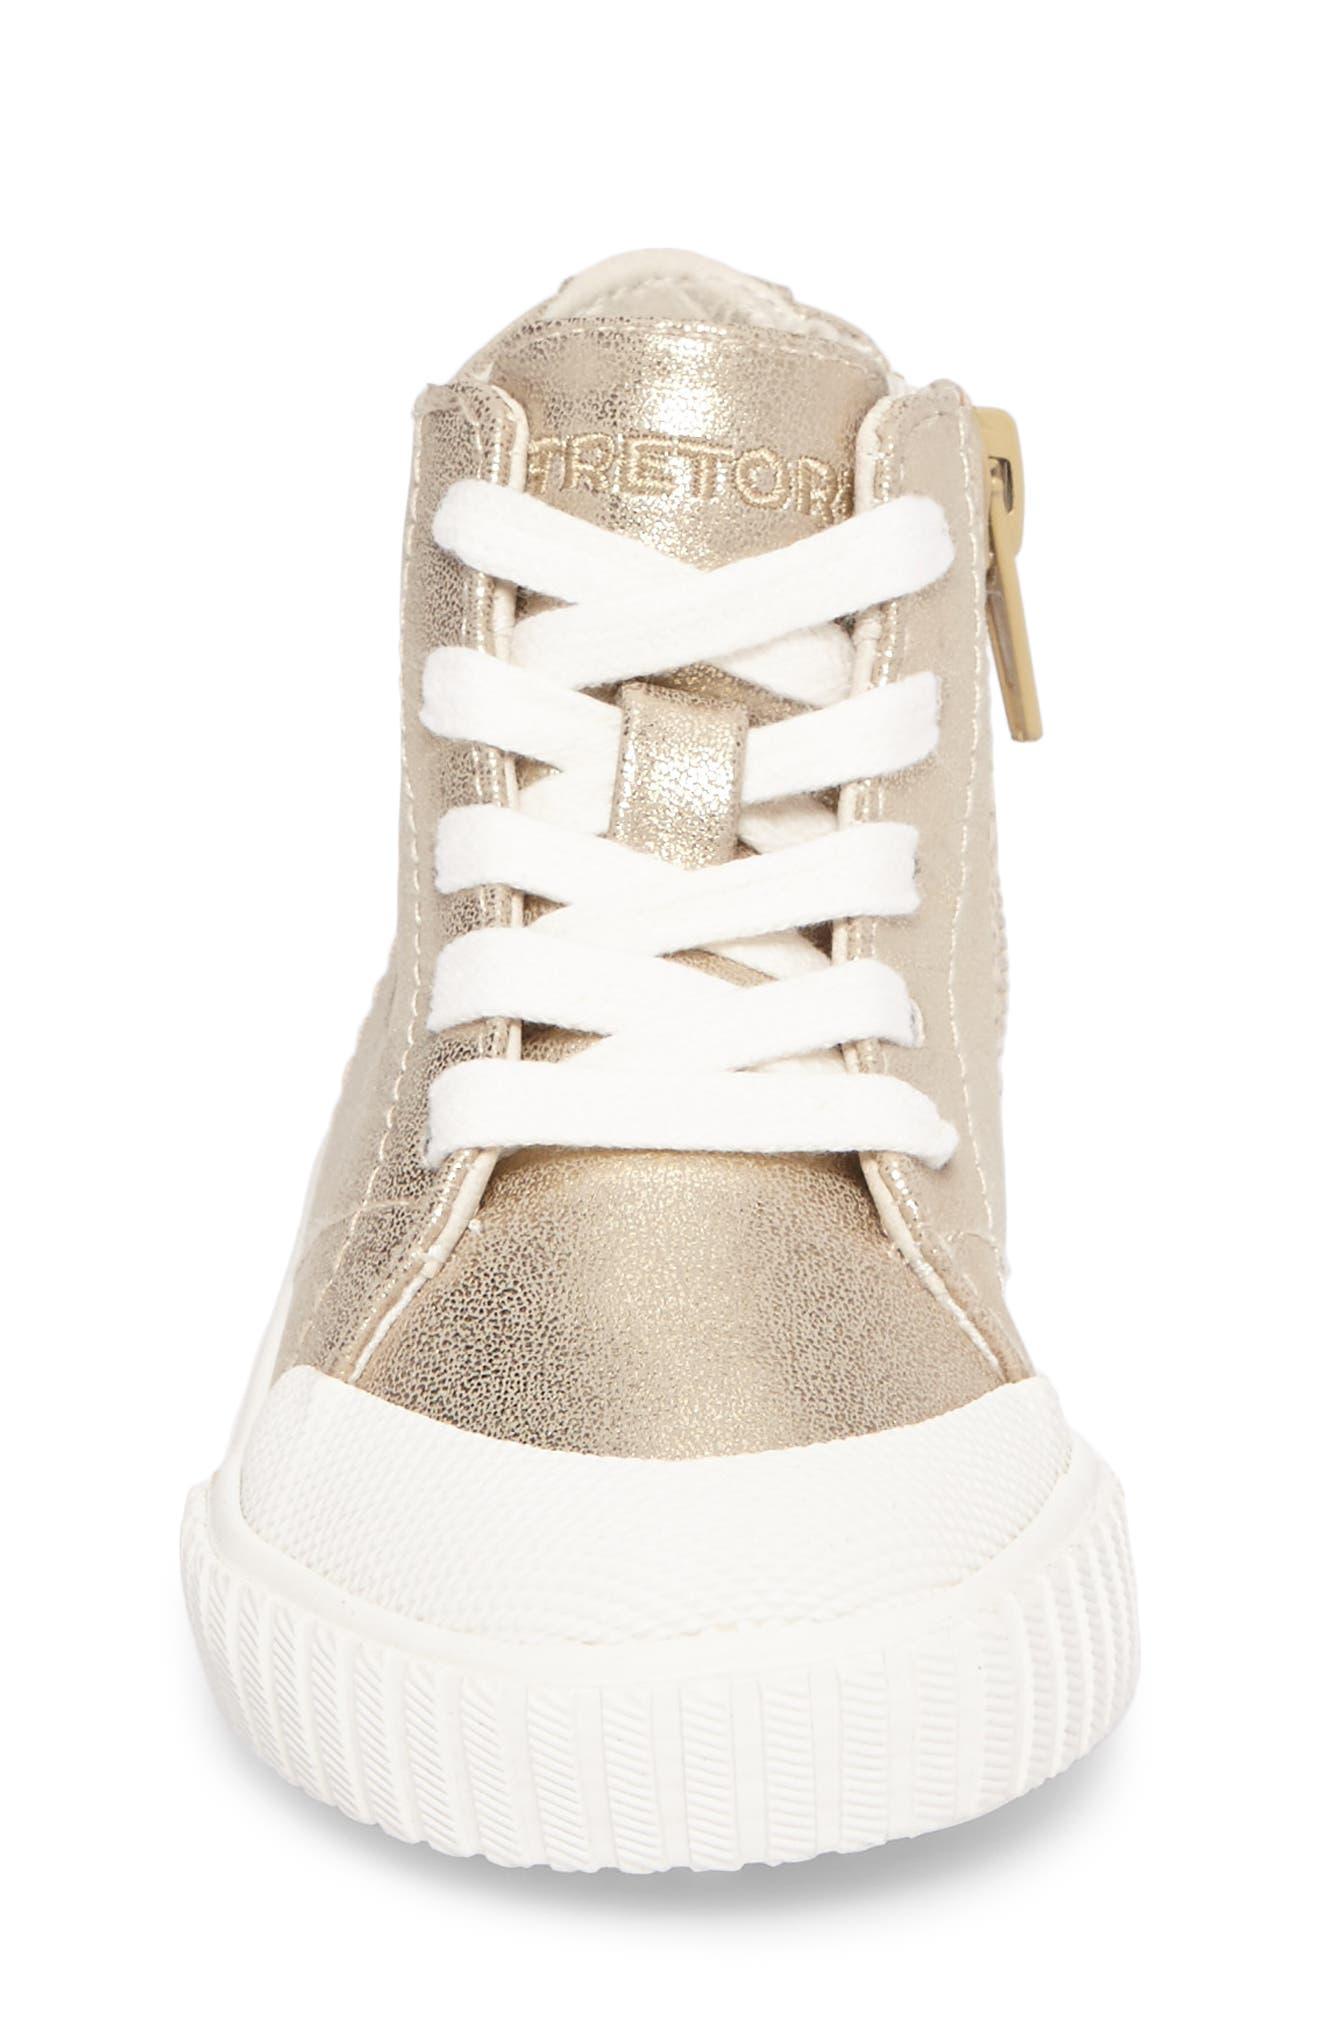 Marley High Top Sneaker,                             Alternate thumbnail 12, color,